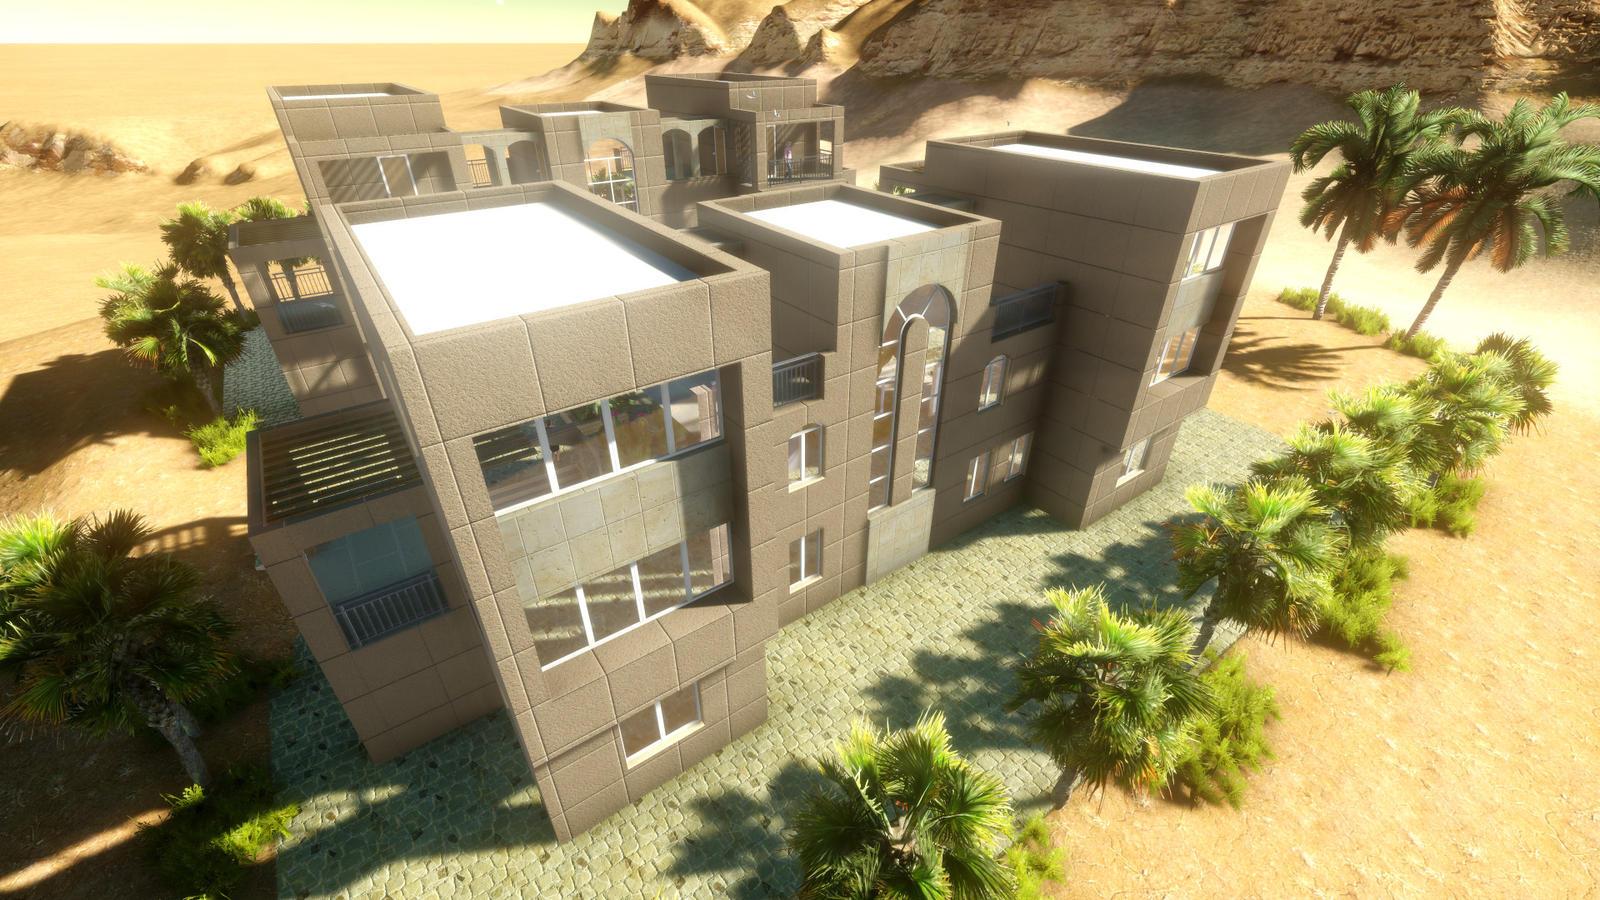 Motel design 3 by abdelmajeed on deviantart for Motel exterior design